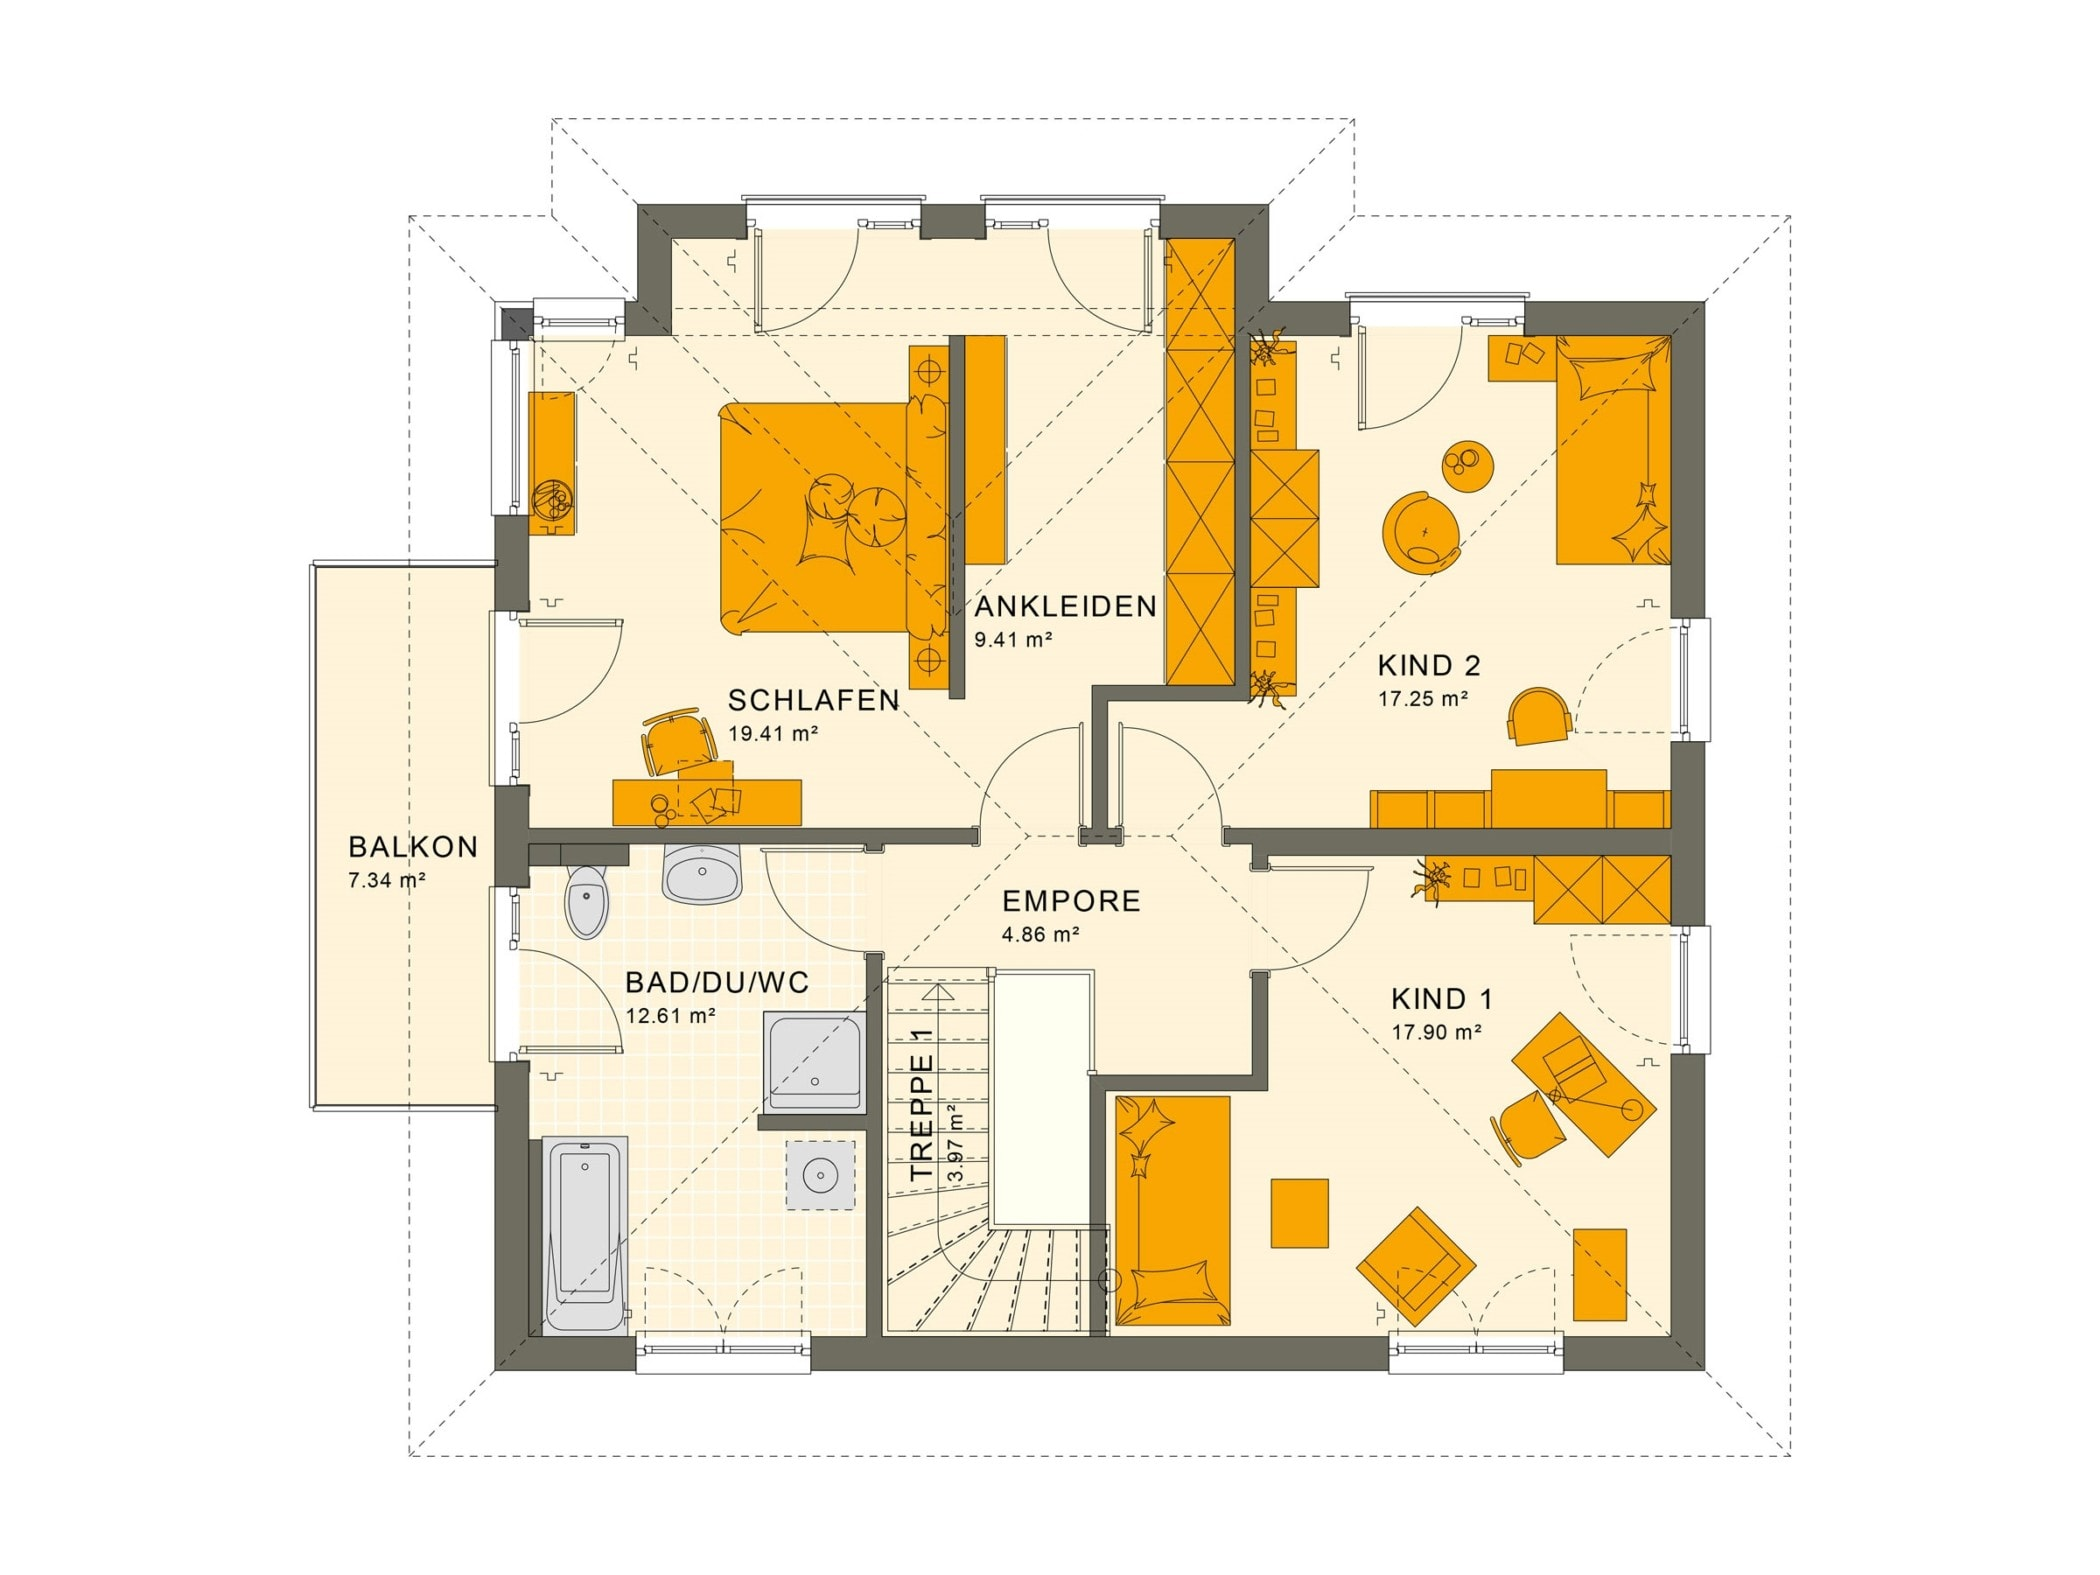 Stadtvilla Grundriss Obergeschoss mit Walmdach & Balkon, 5 Zimmer, 165 qm - Fertighaus SUNSHINE 165 V6 von Living Haus - HausbauDirekt.de